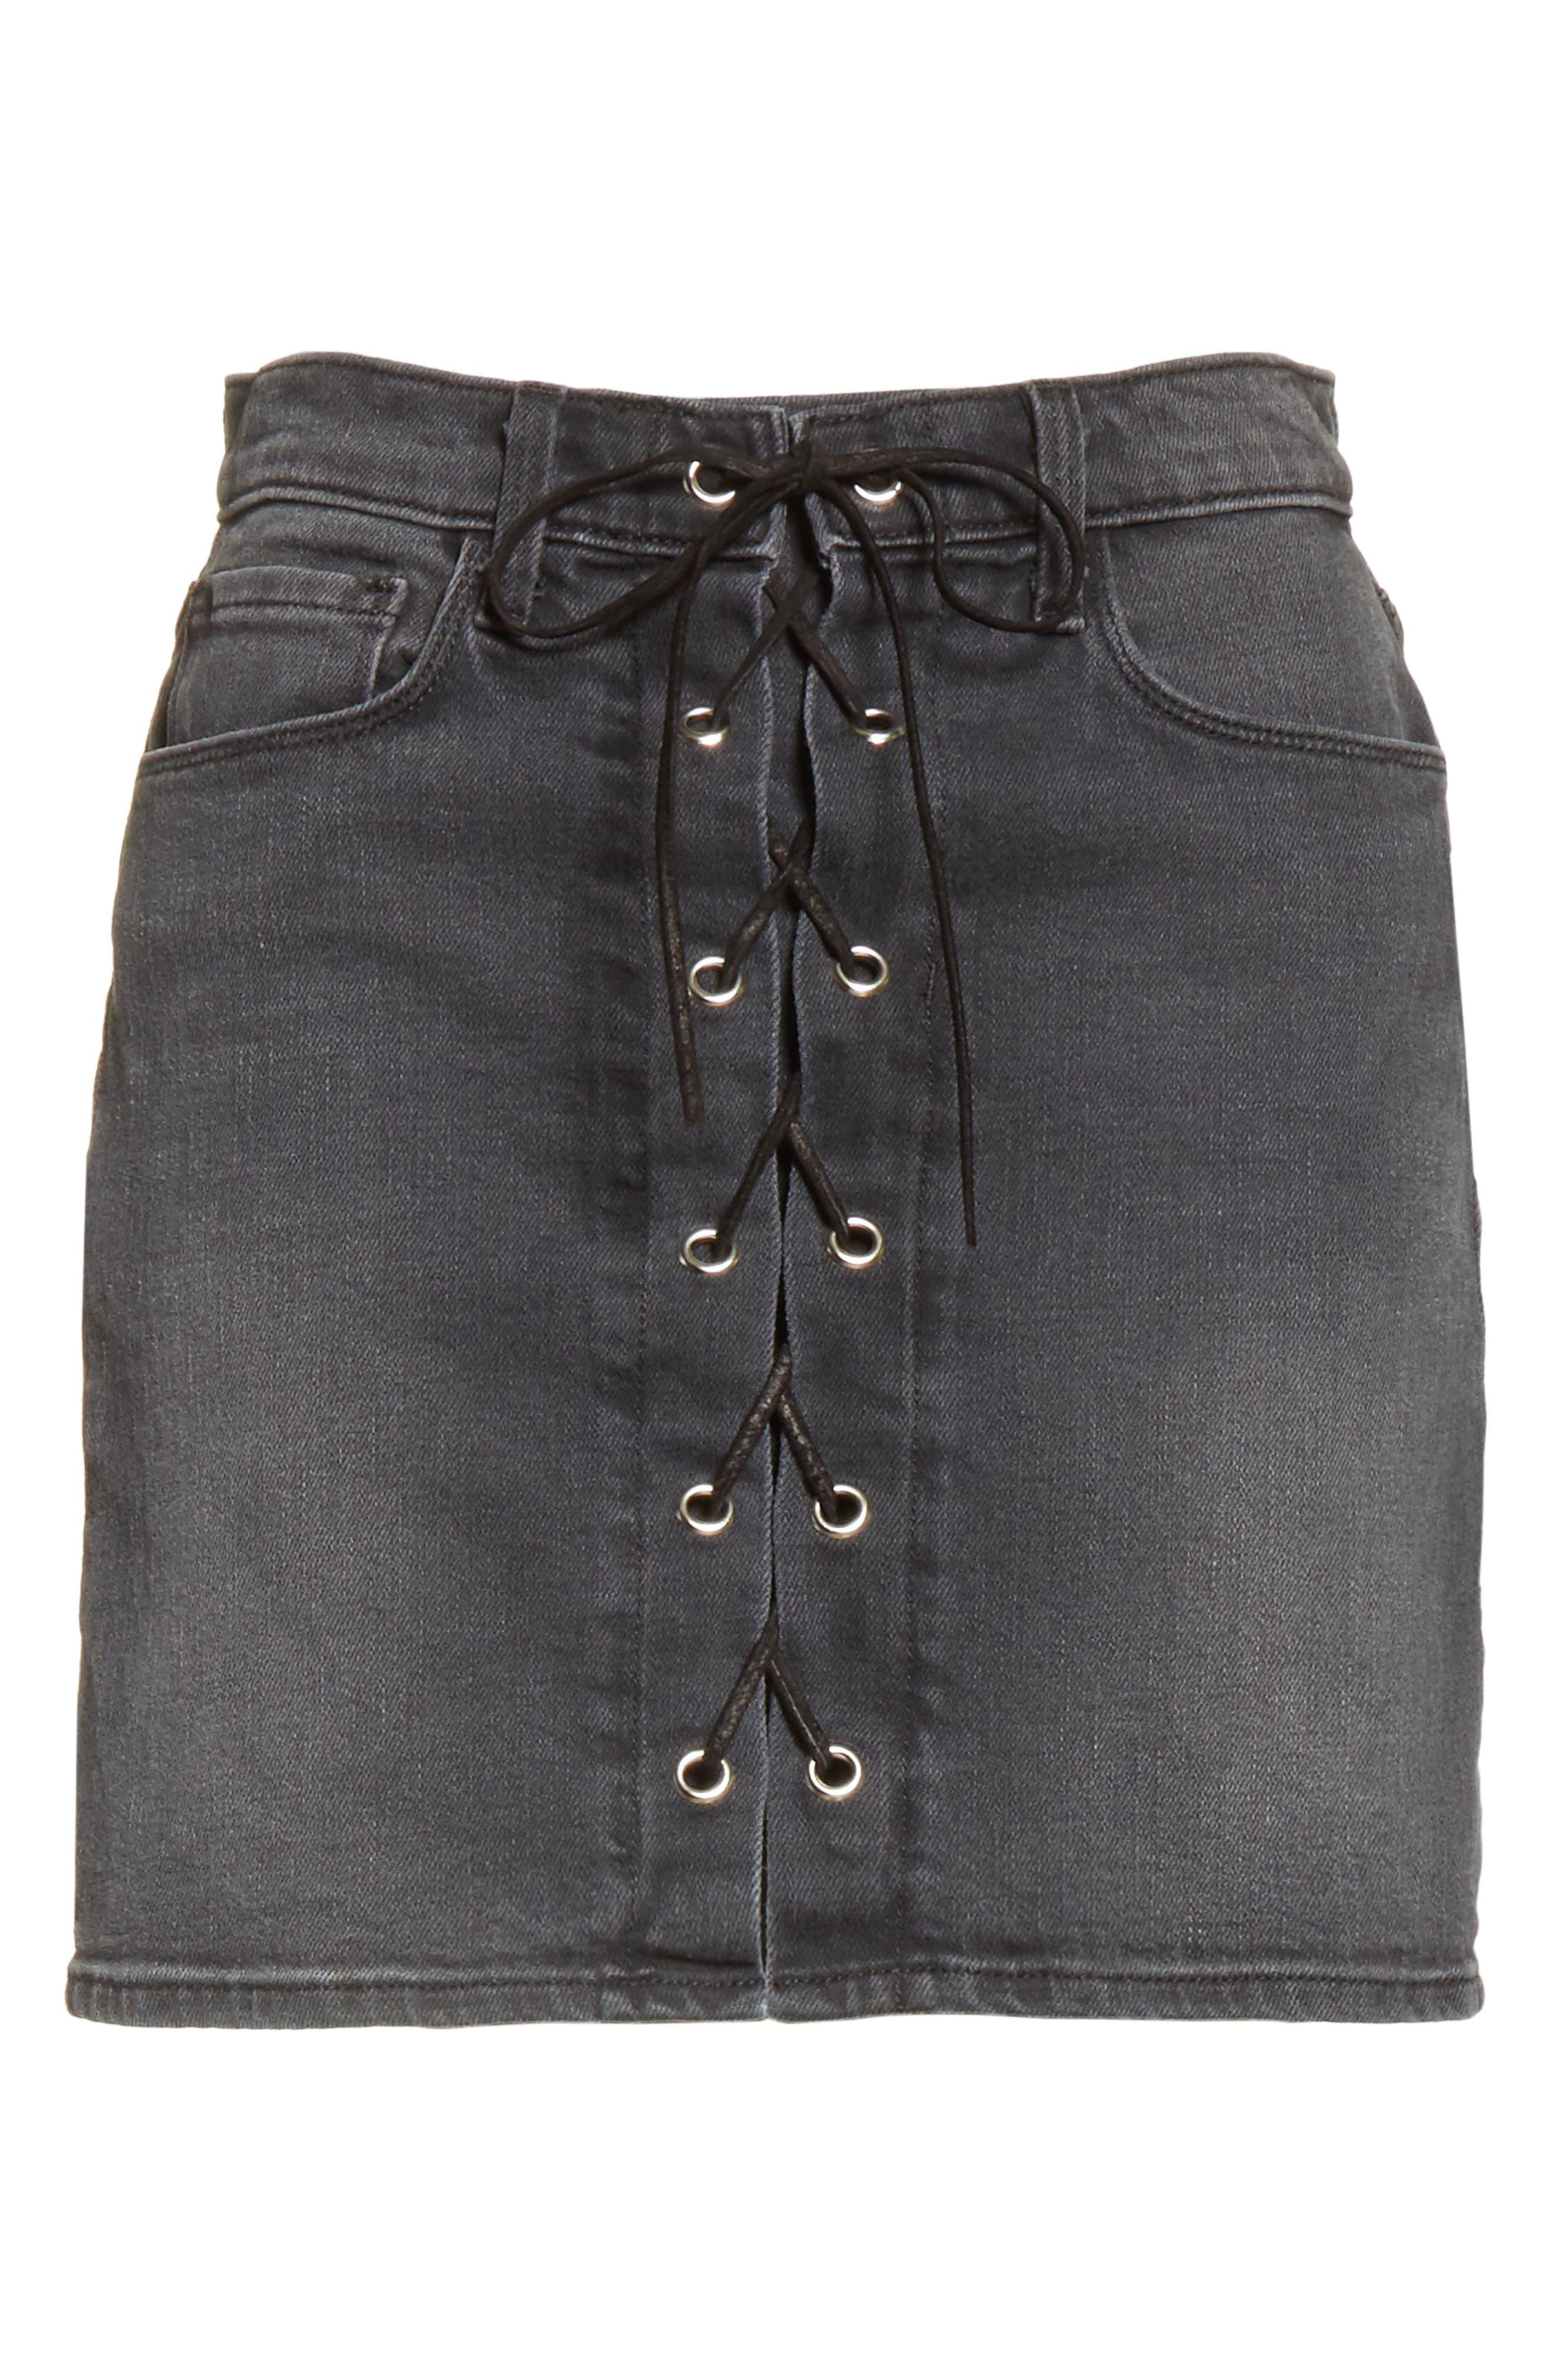 Portia Lace Up Denim Skirt,                             Alternate thumbnail 6, color,                             006